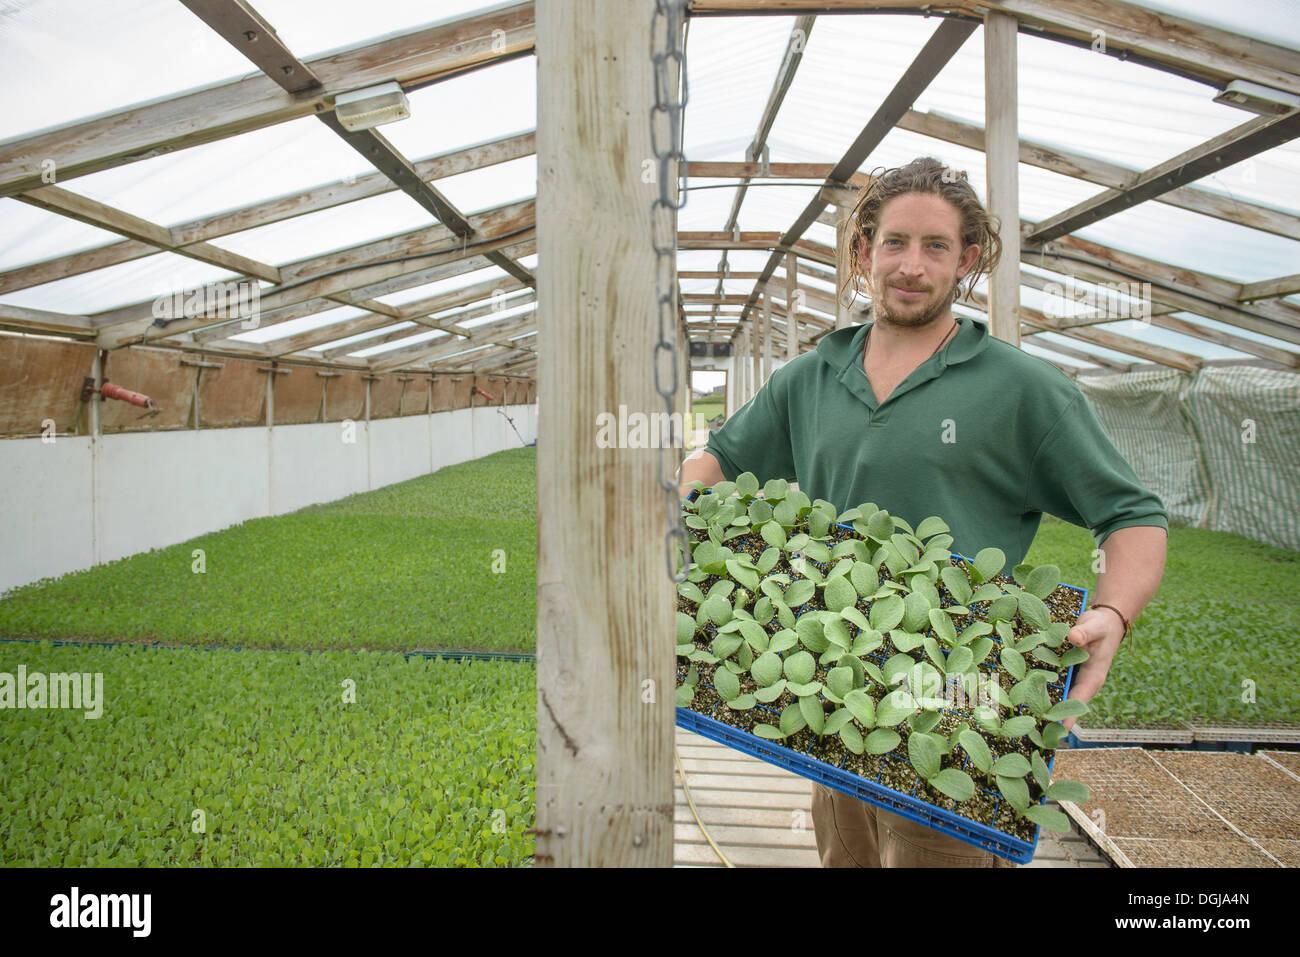 Farmer holding seedlings to plant on organic farm, portrait - Stock Image